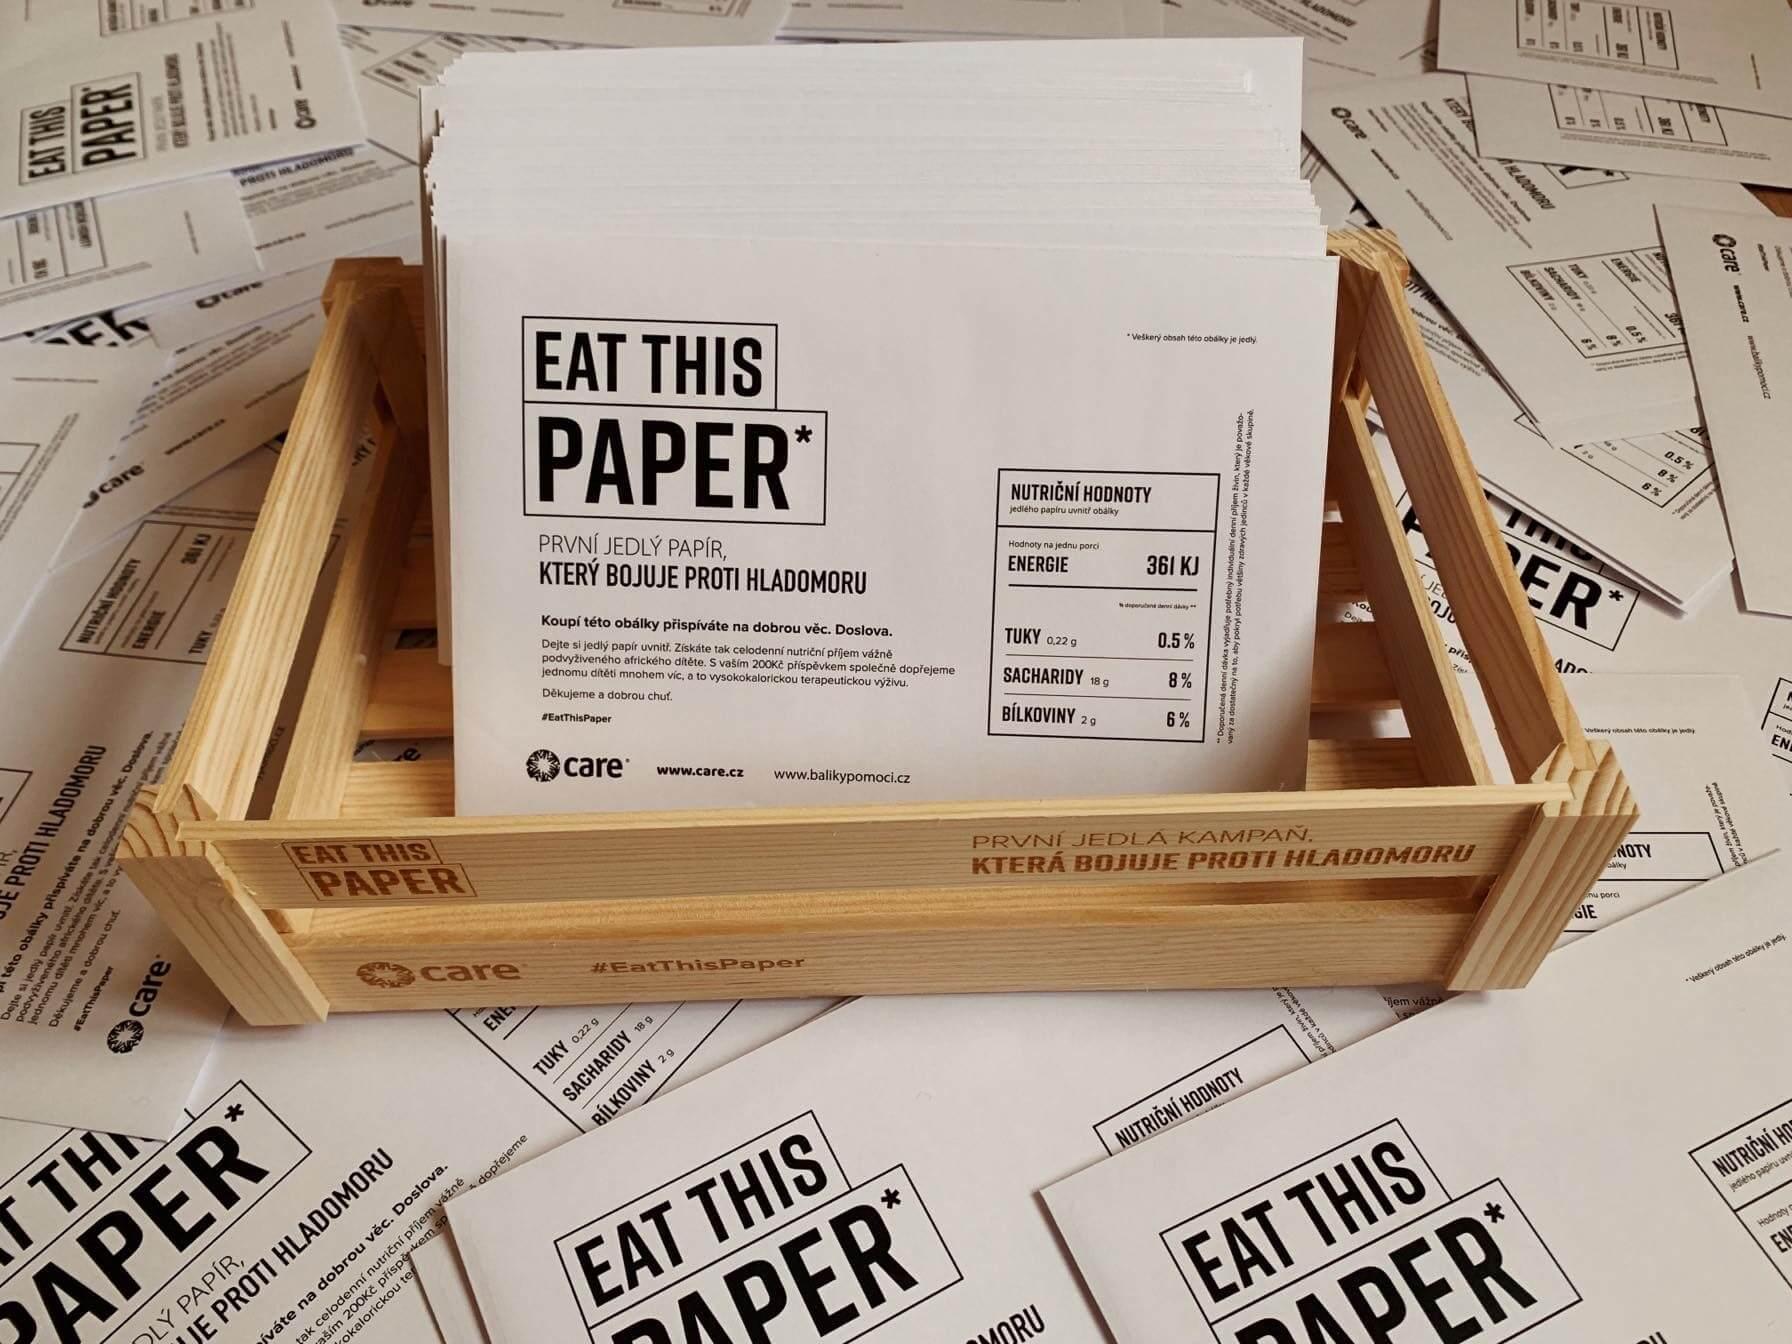 EAT THIS PAPER bojuje proti hladomoru